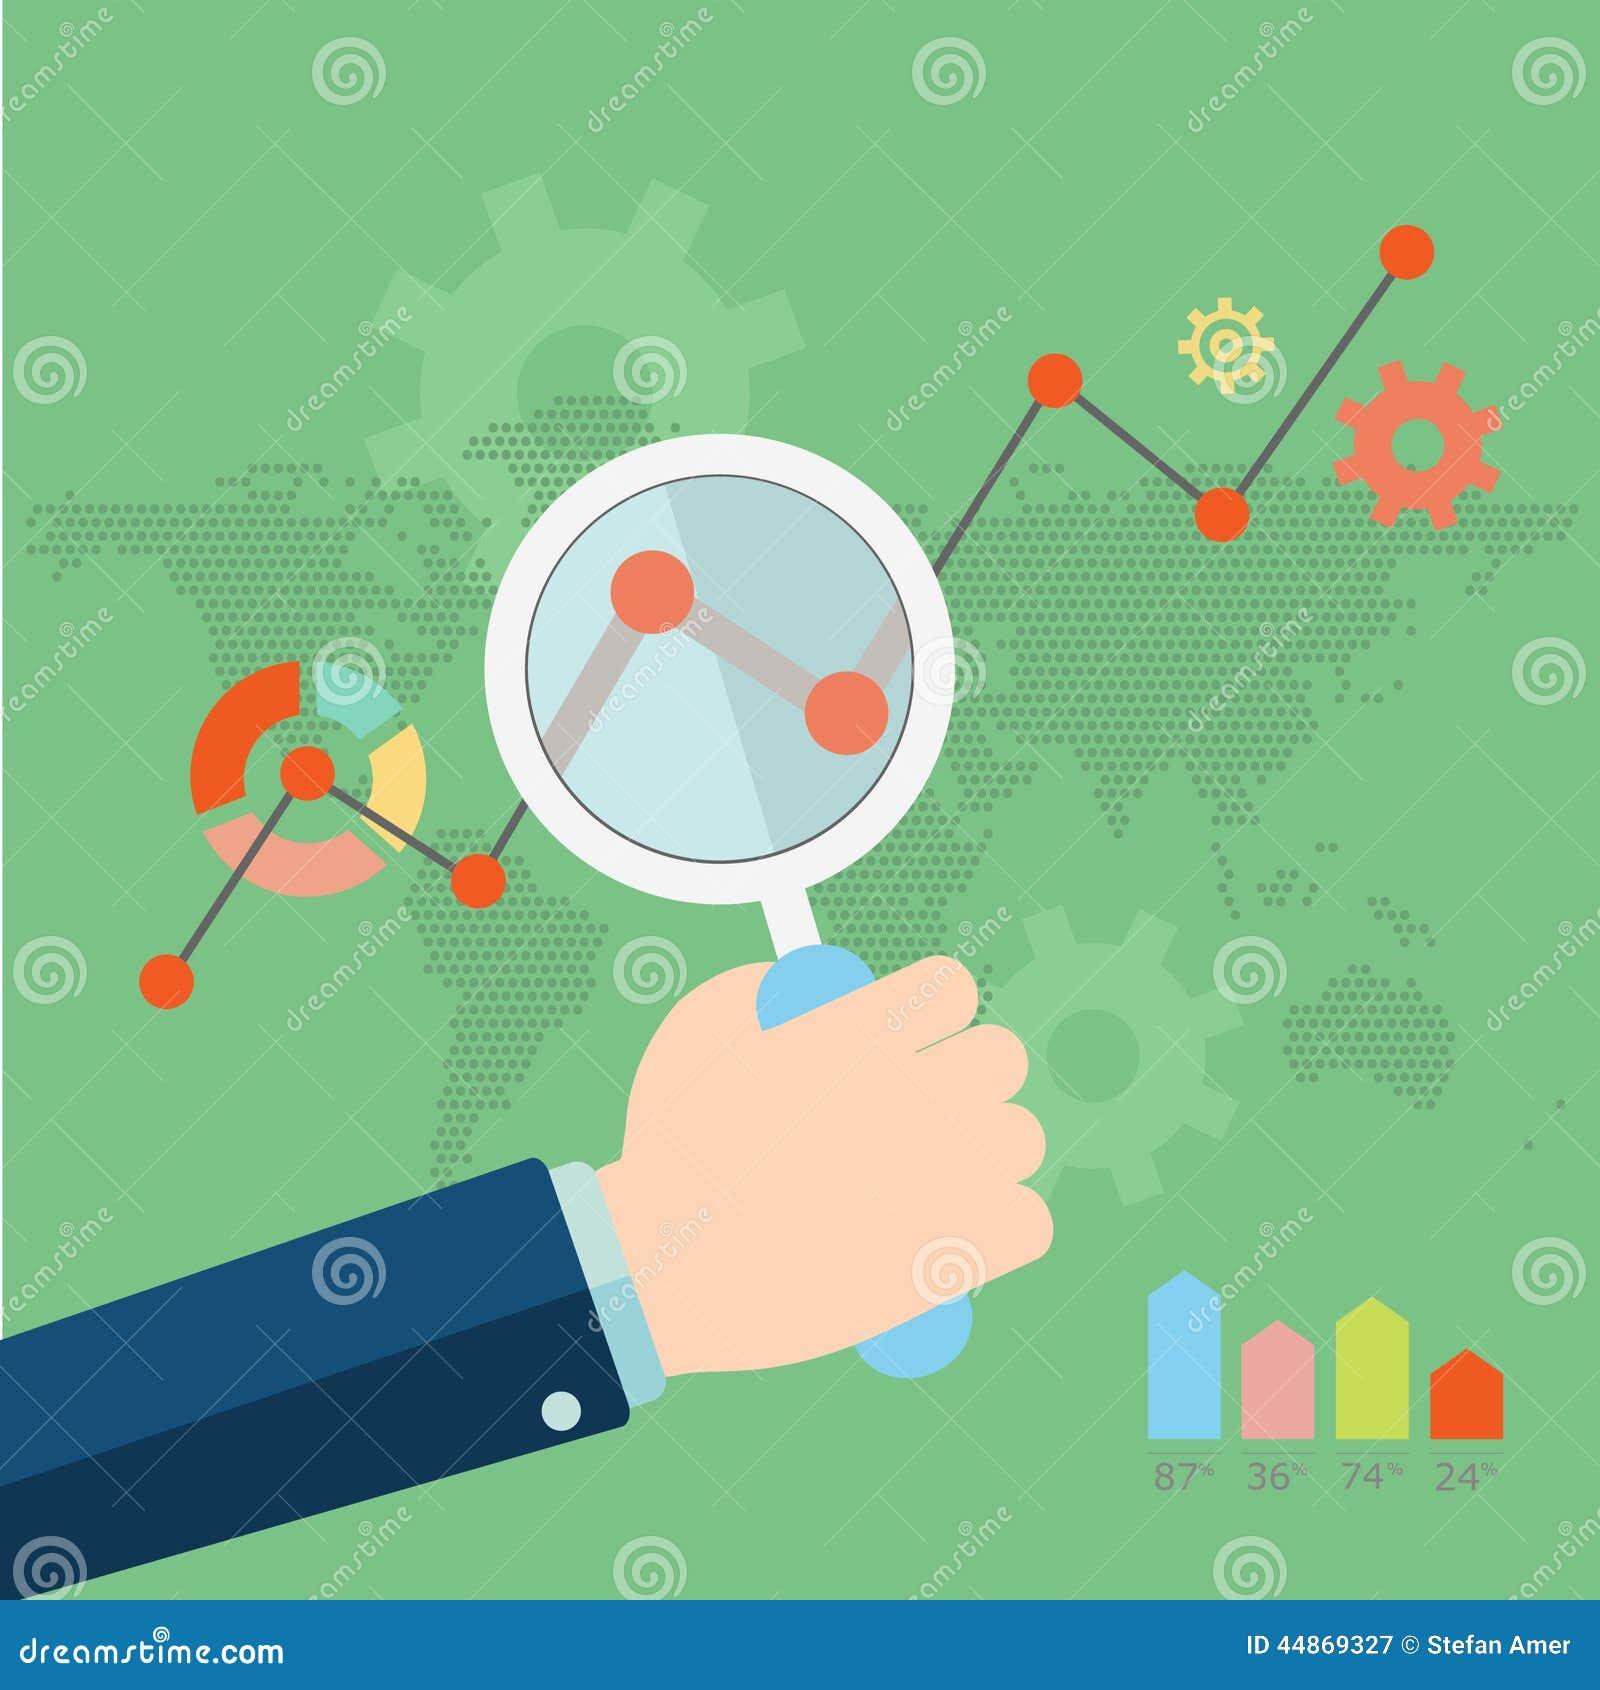 Flat vector illustration of web analytics